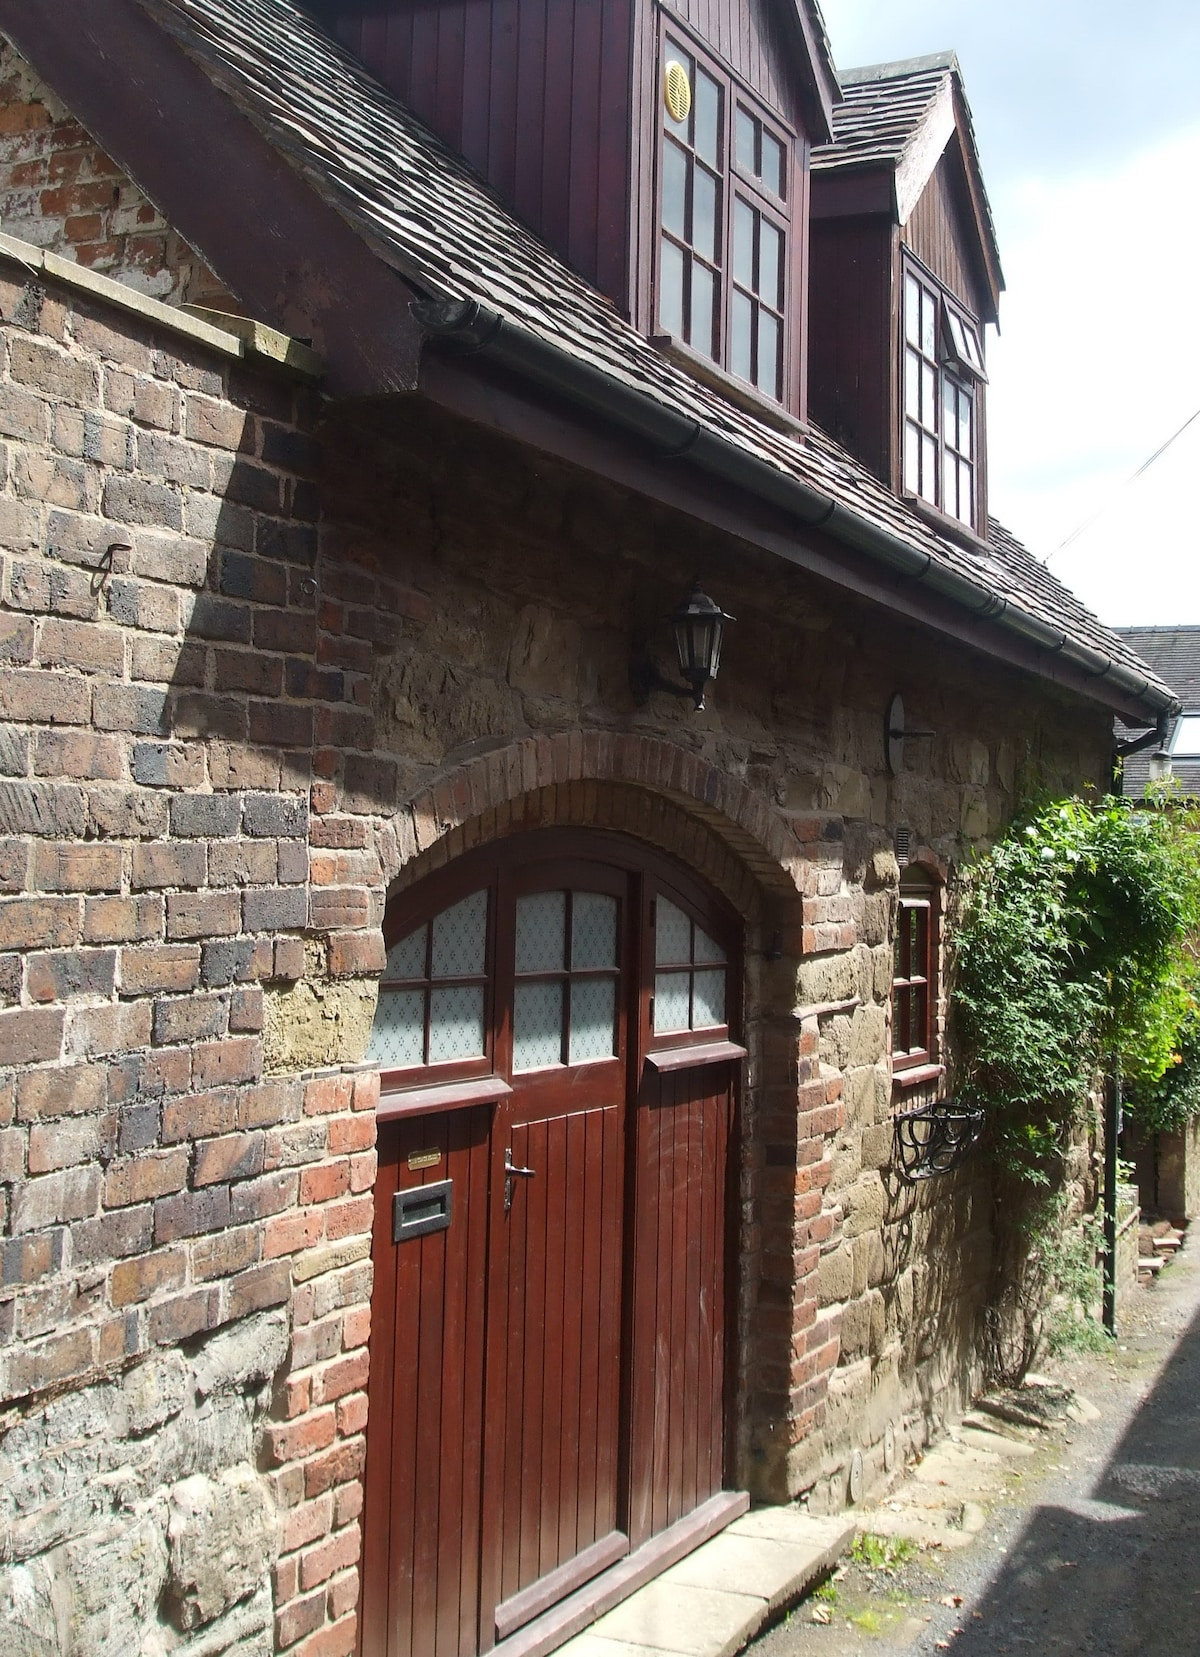 The Coach House in Barn Lane